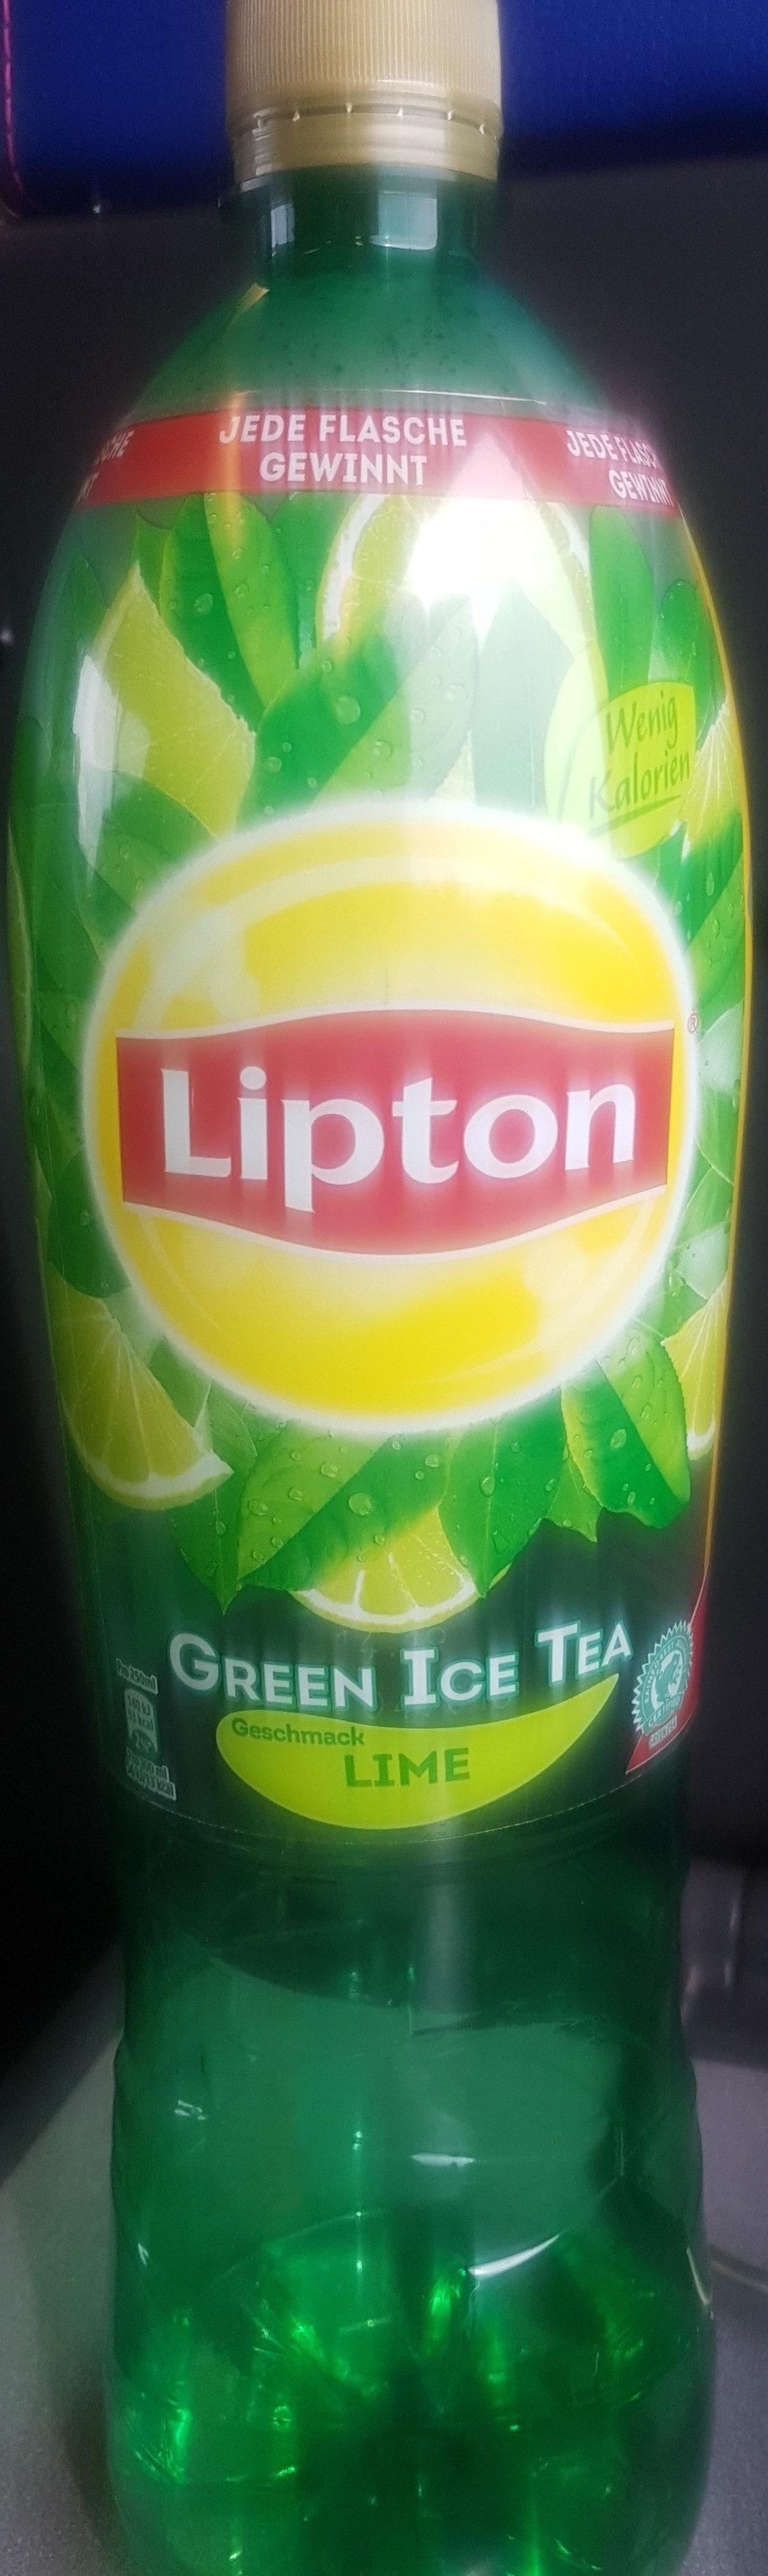 Lipton Green Ice Tea Lime - Product - en